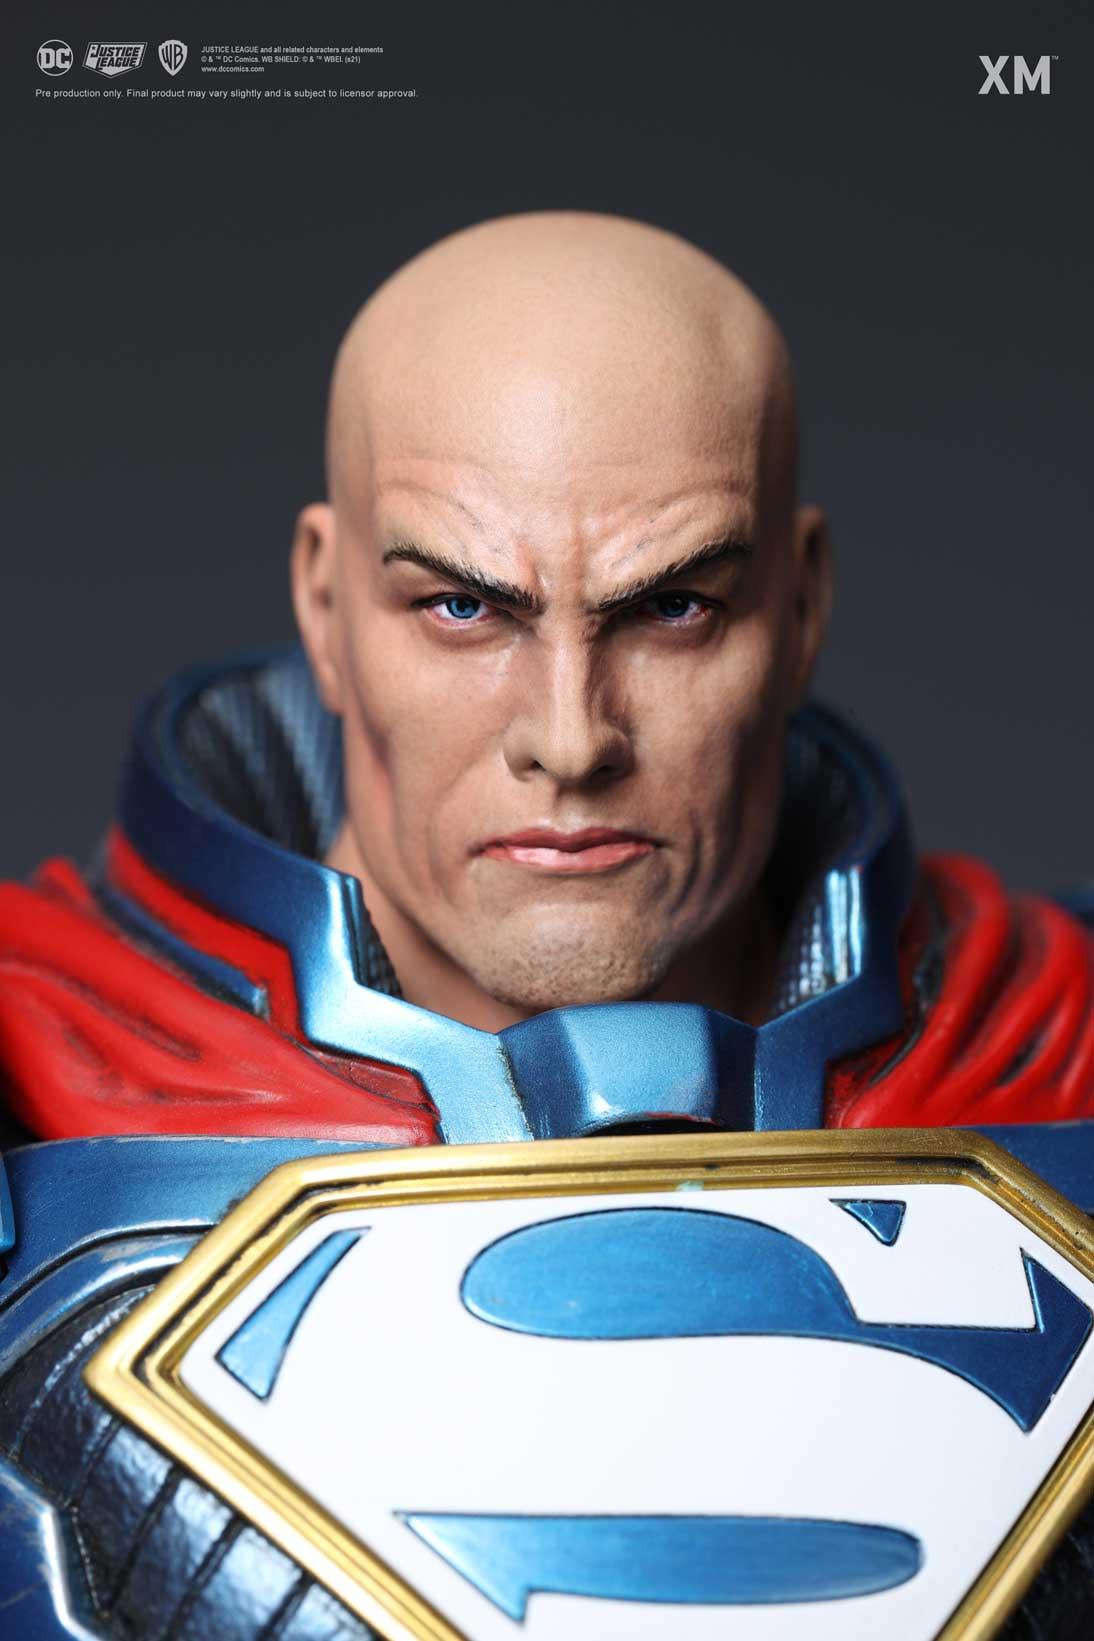 Link a Xm Studios_Lex_Luthor_Superman_DC- (16)